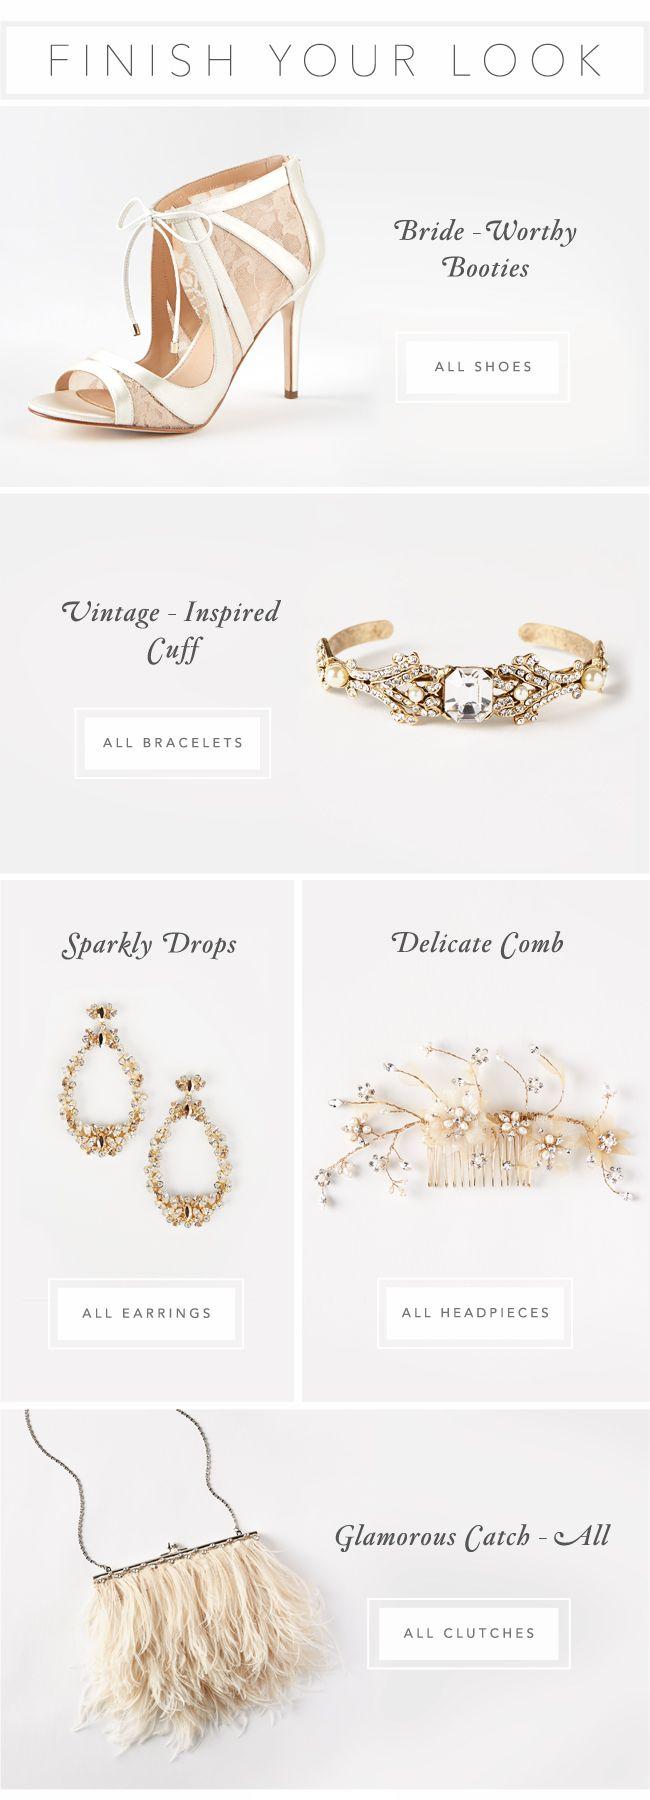 BHLDN | Anthropologie Weddings | Accessories | Email Design | Editorial Design